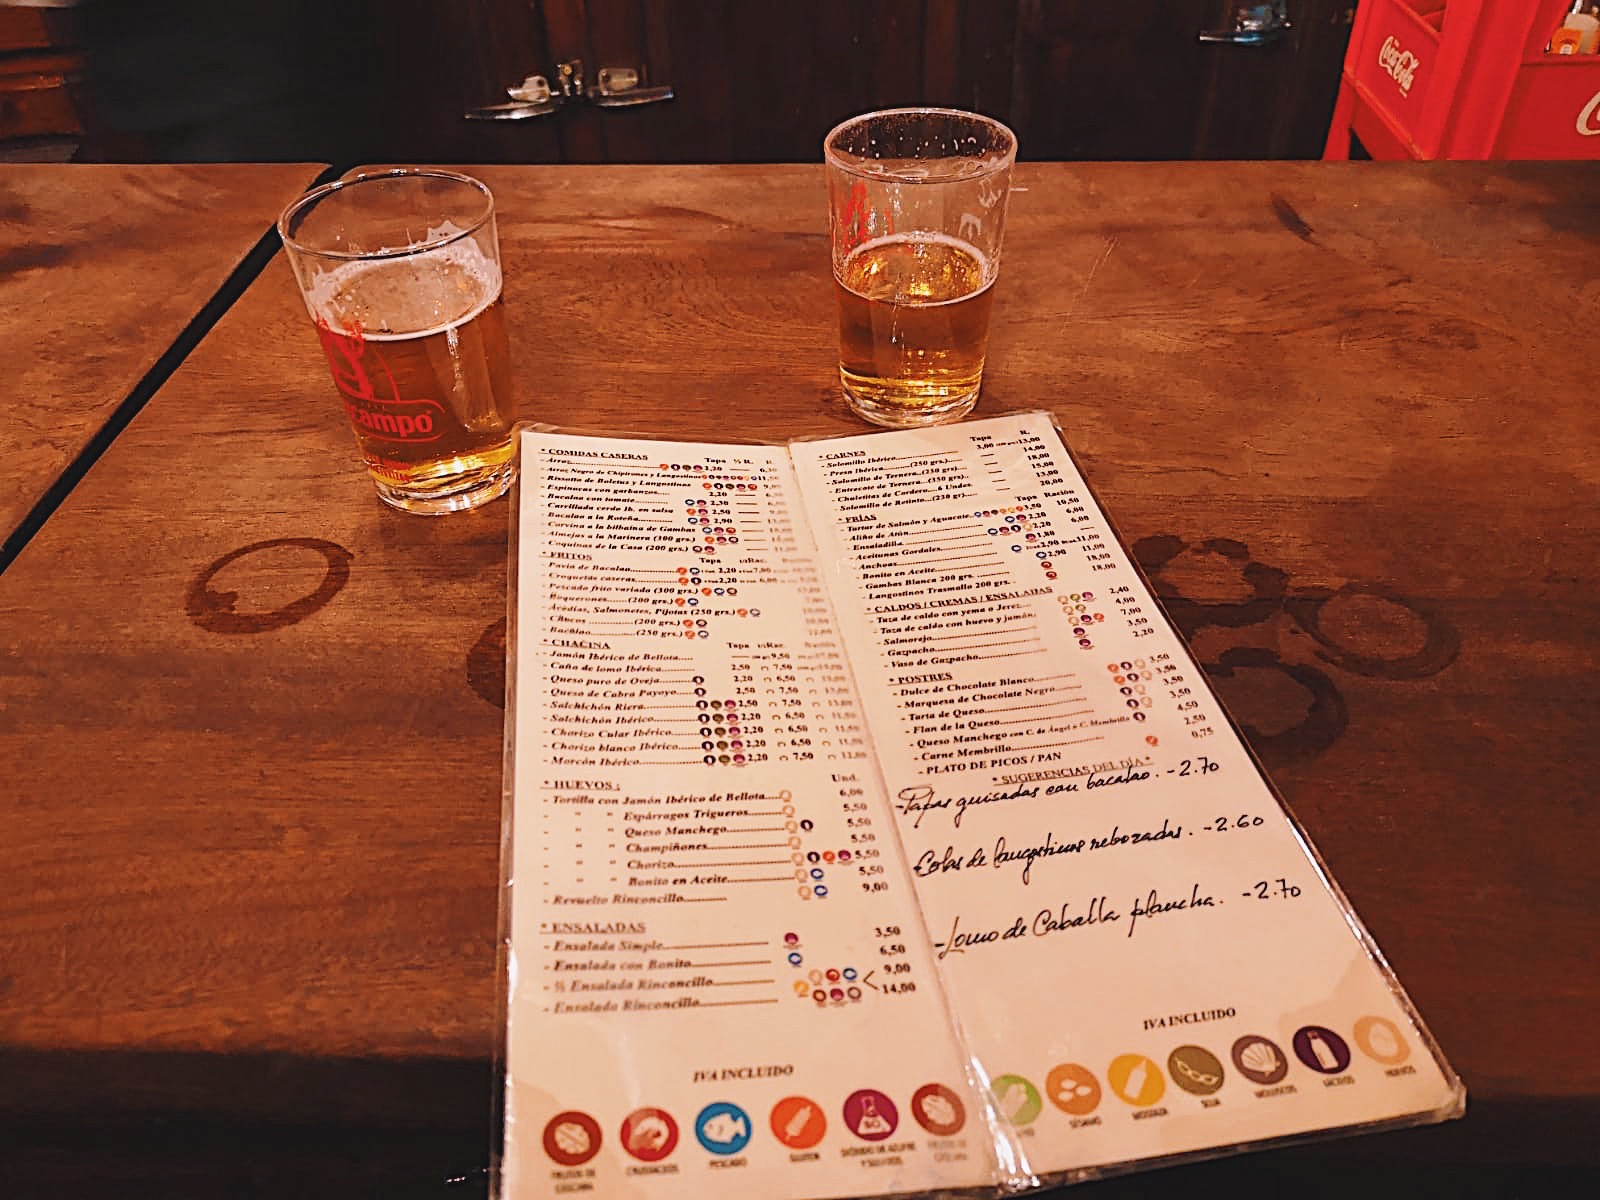 redhead-round-the-world-blogger-food-foodie-foodblog-spain-el-rinconcillo-beers-menu-inside.JPG